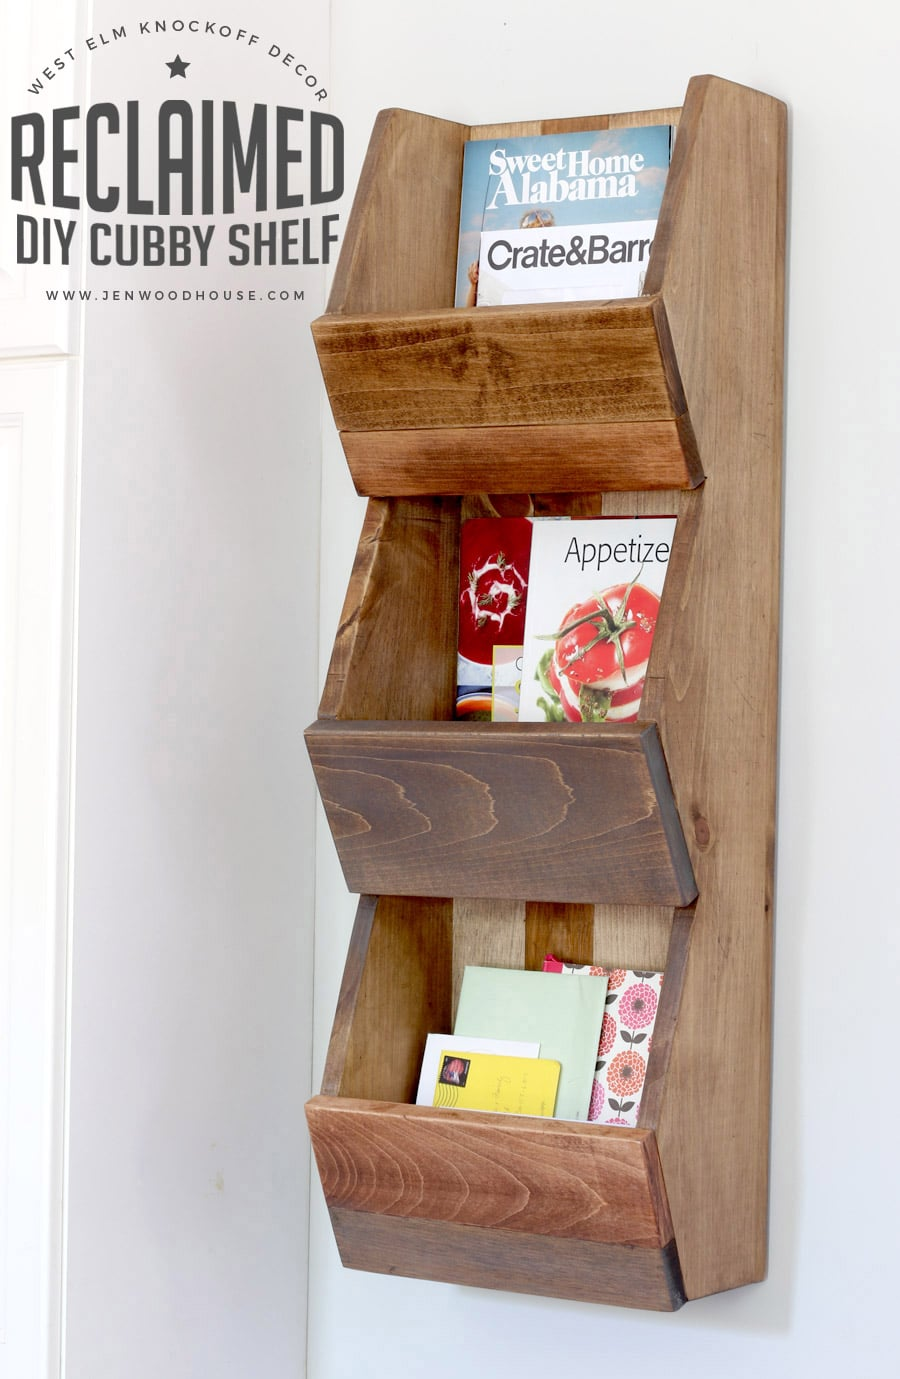 West Elm Knockoff Decor Series: Reclaimed Cubby Shelf